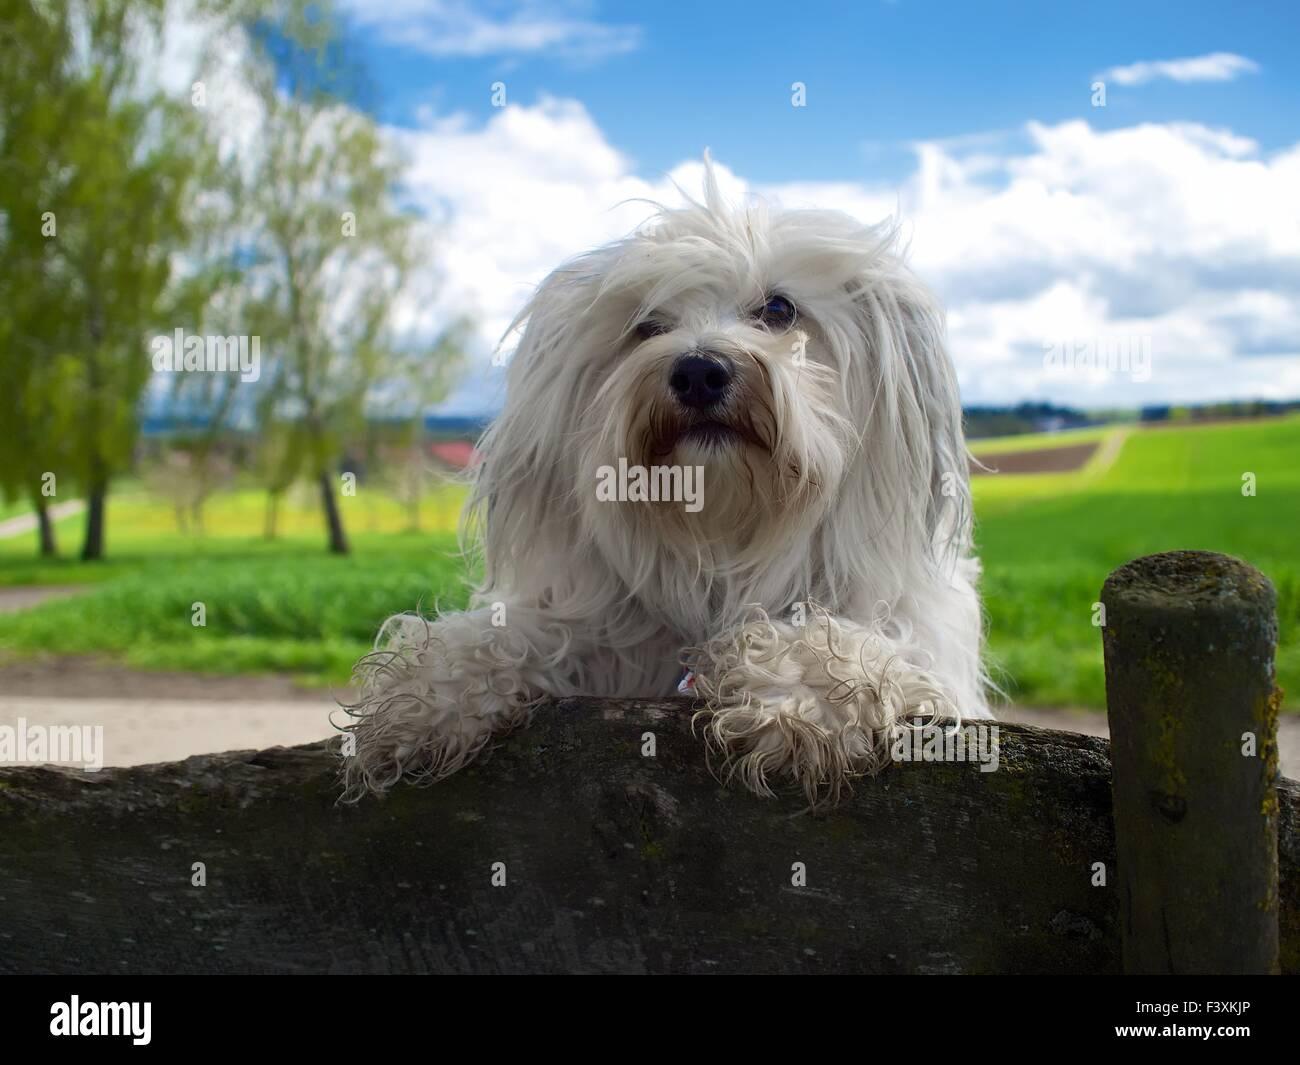 Cool Dog Imagen De Stock